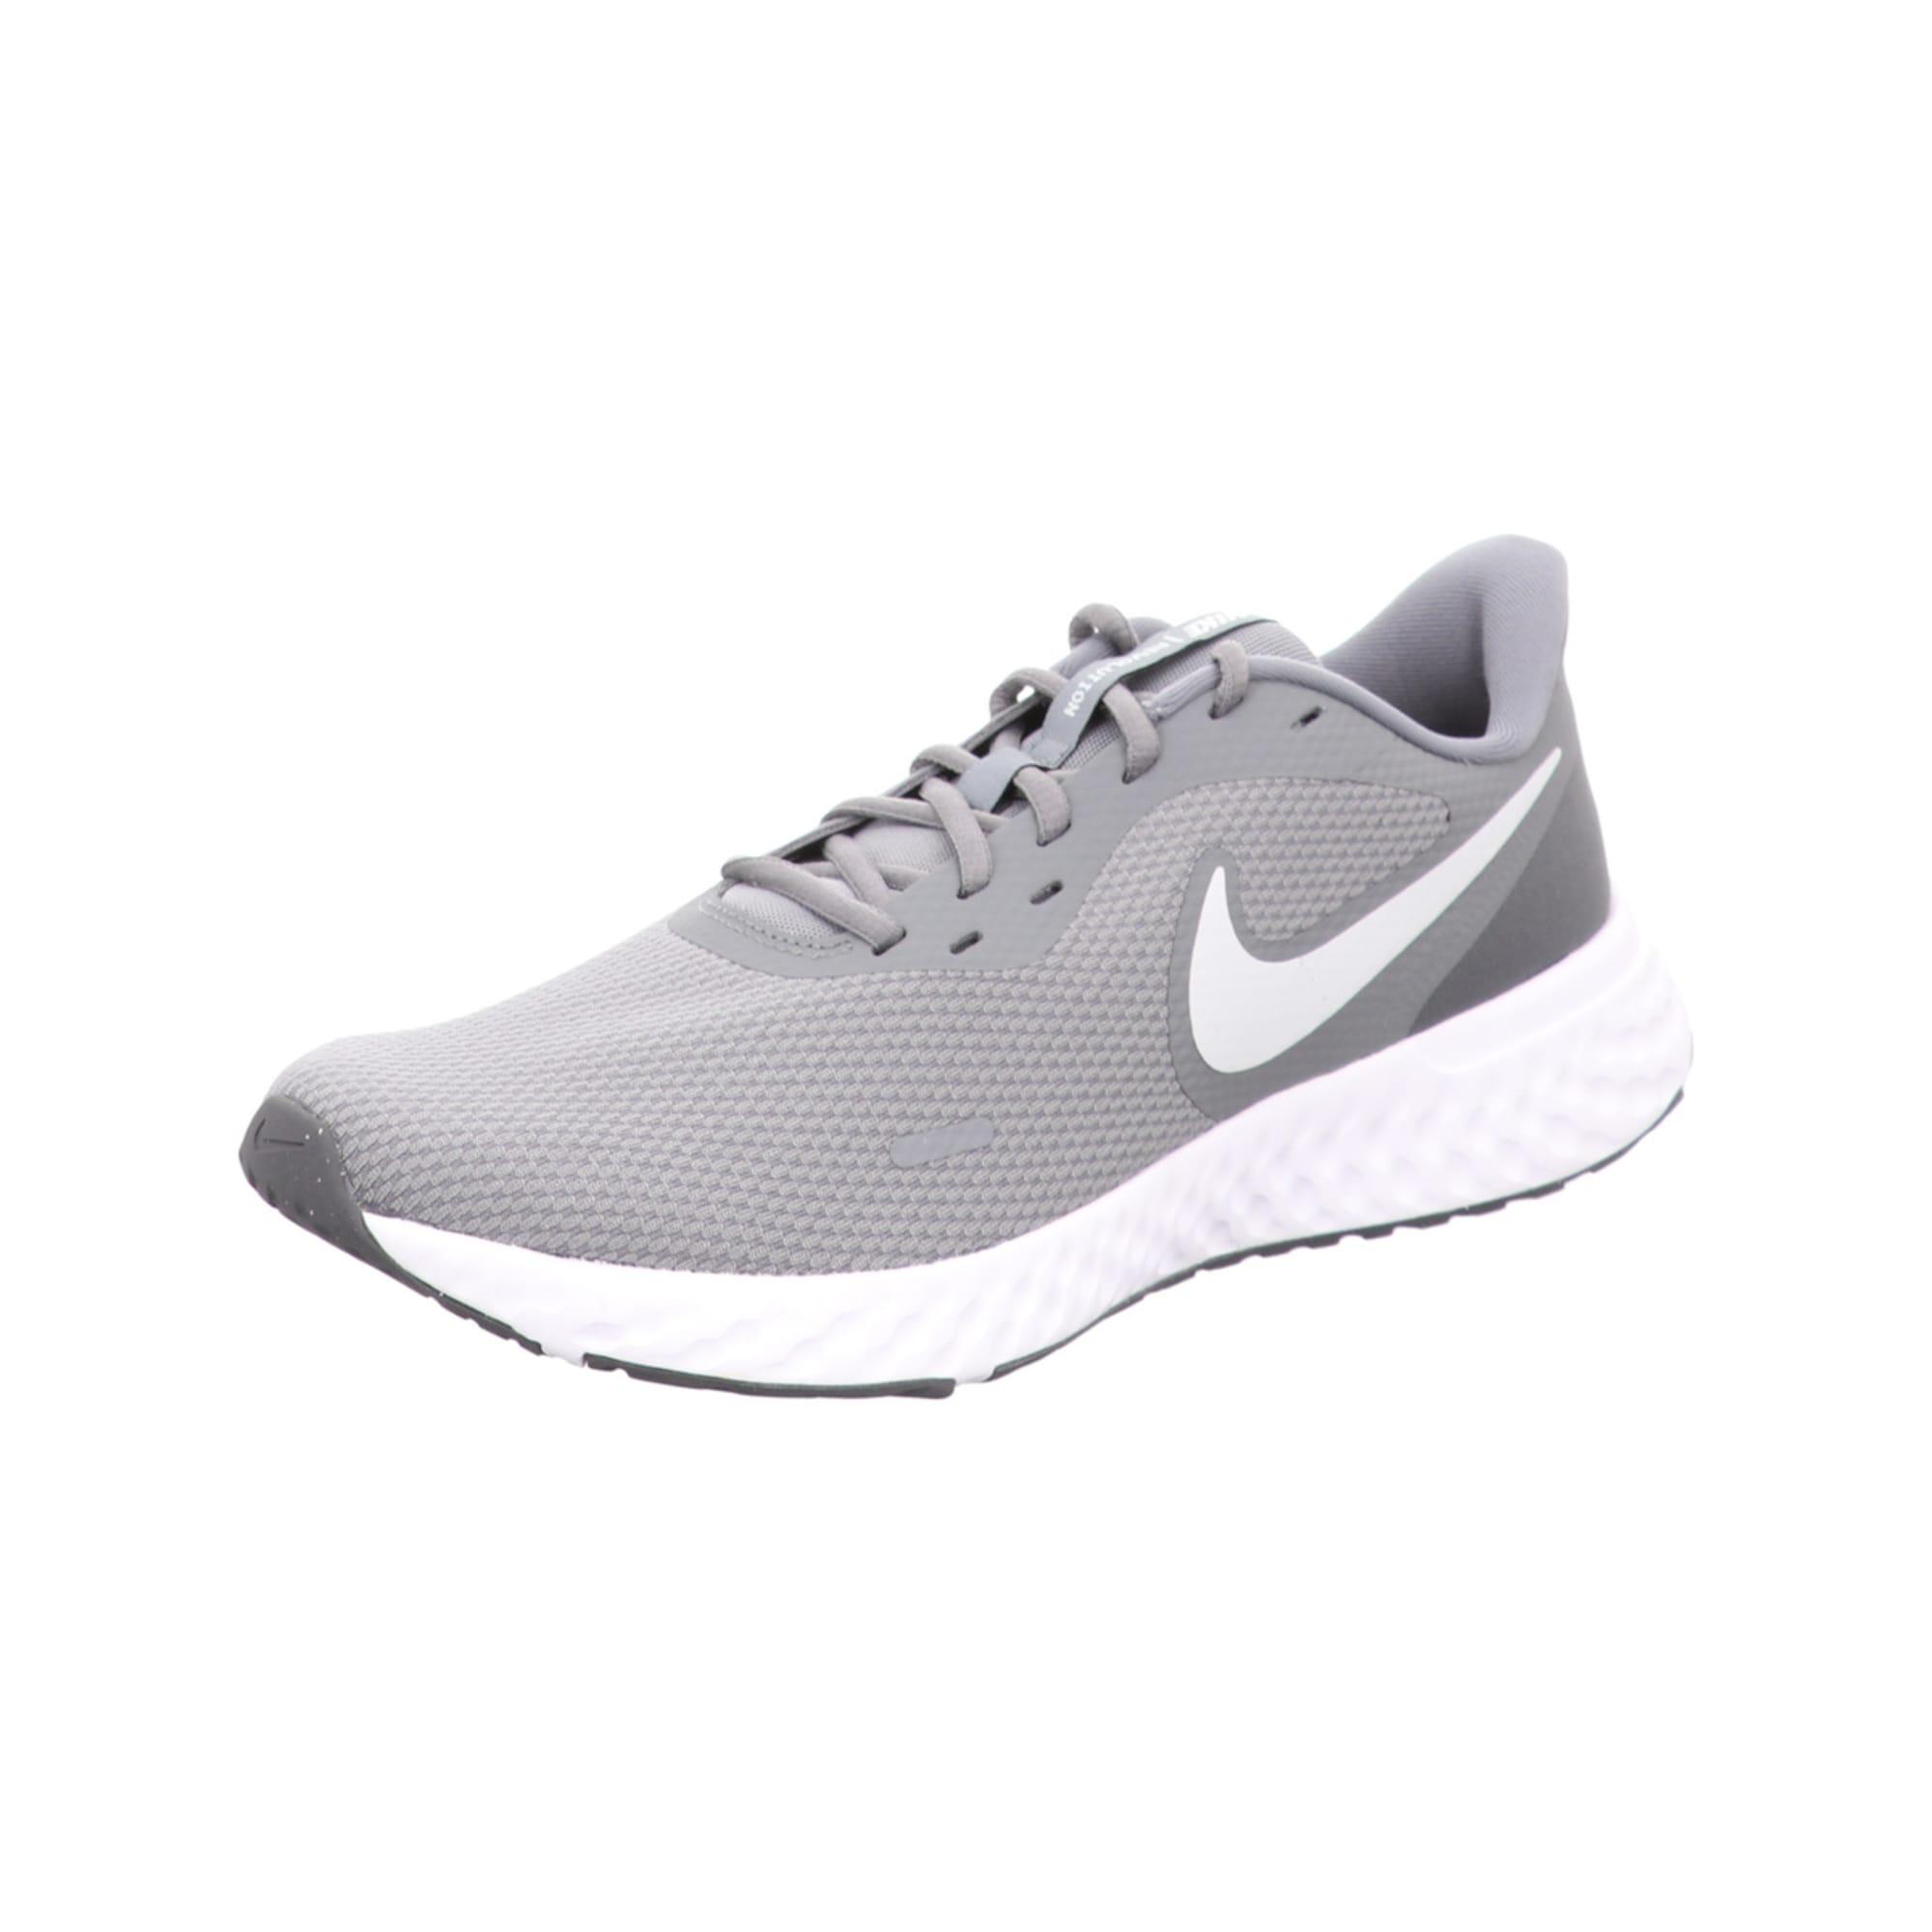 NIKE Bėgimo batai balta / pilka